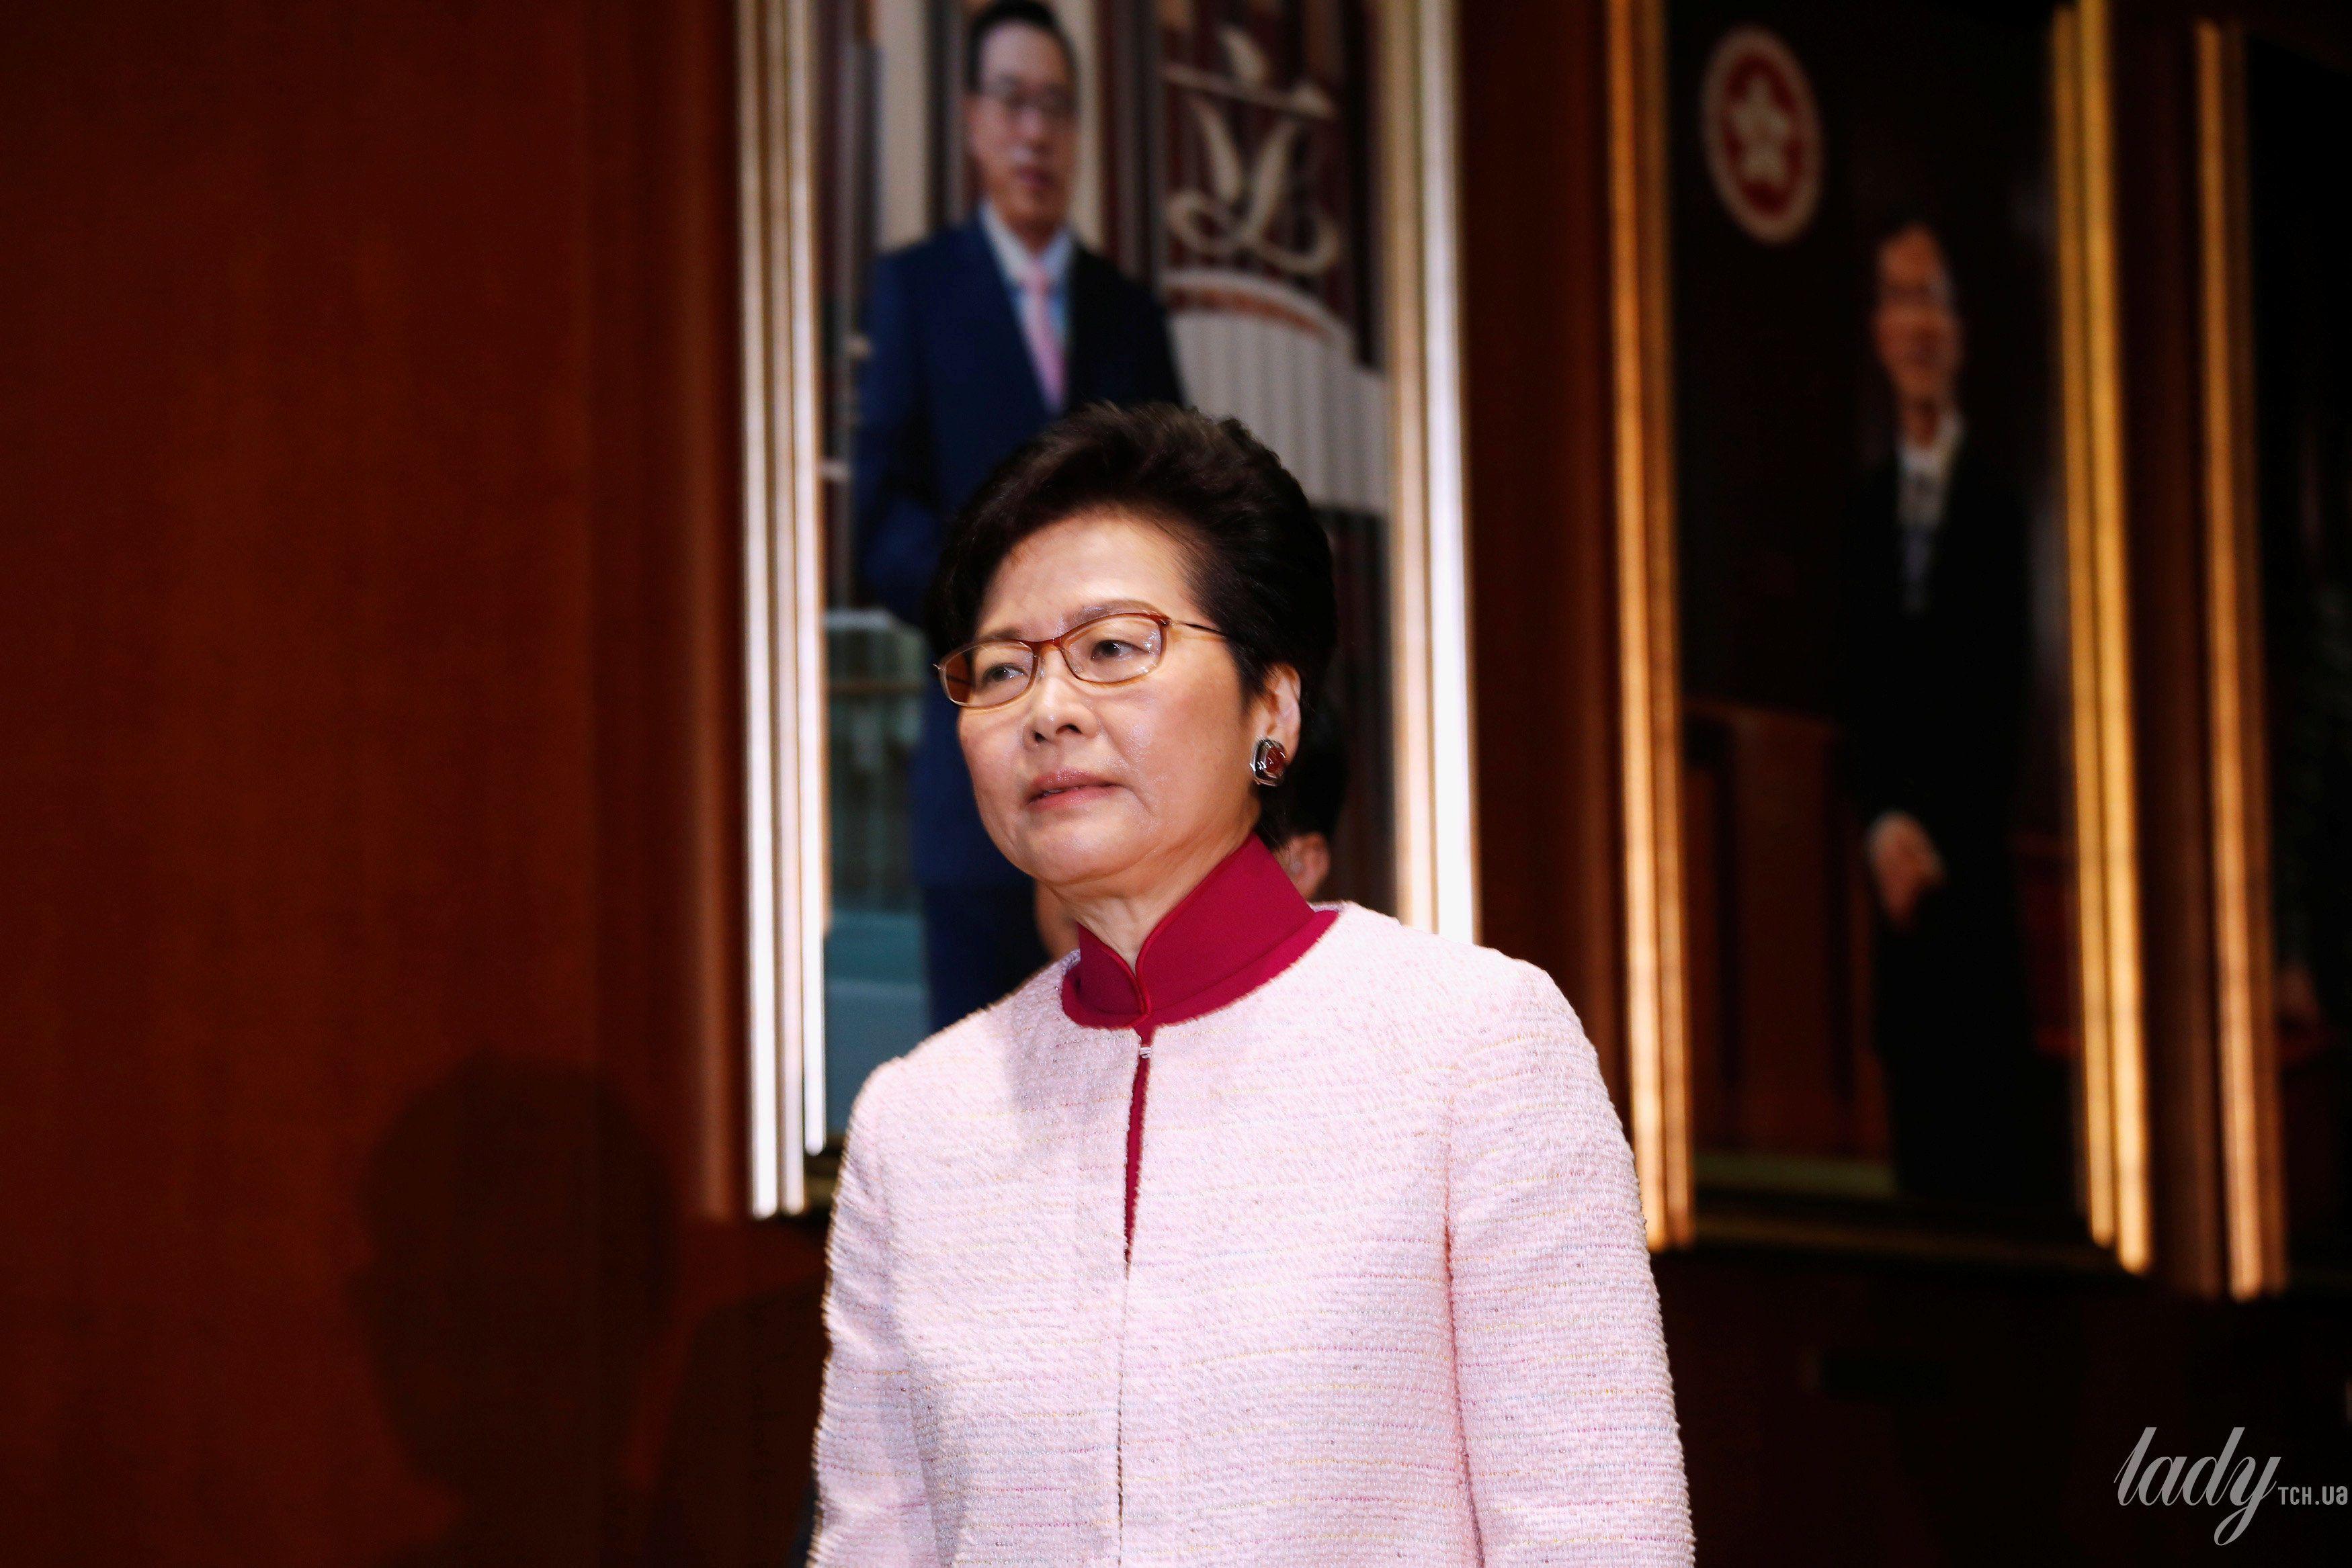 Глава администрации Гонконга Кэрри Лам_3